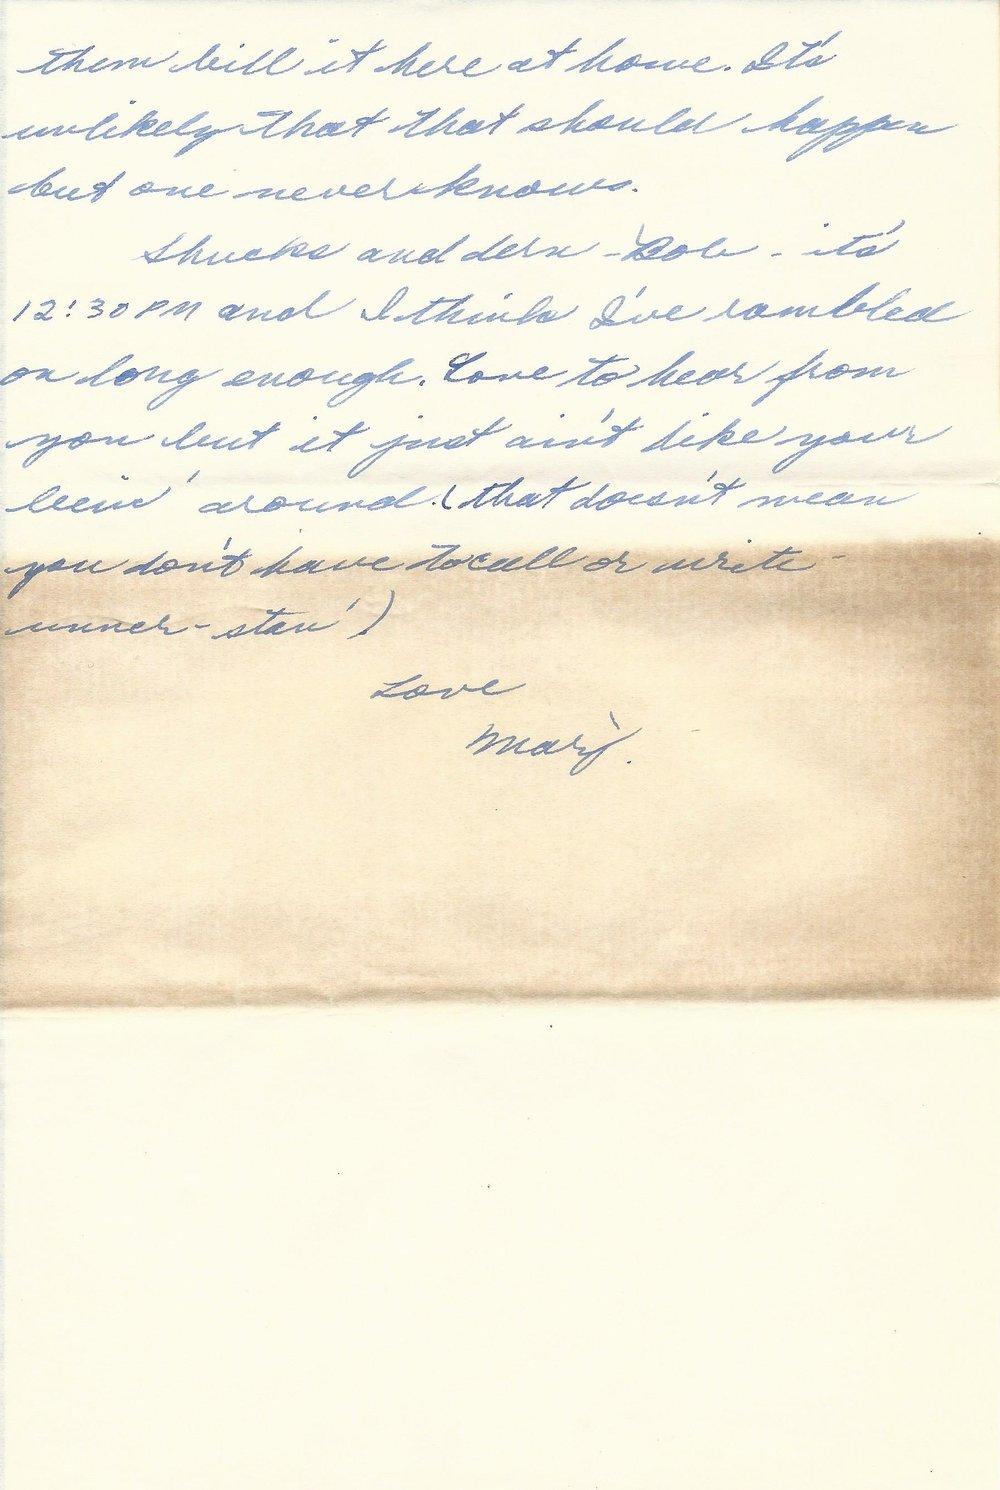 2. Jan. 5, 1953 (Oma)_Page_06.jpg